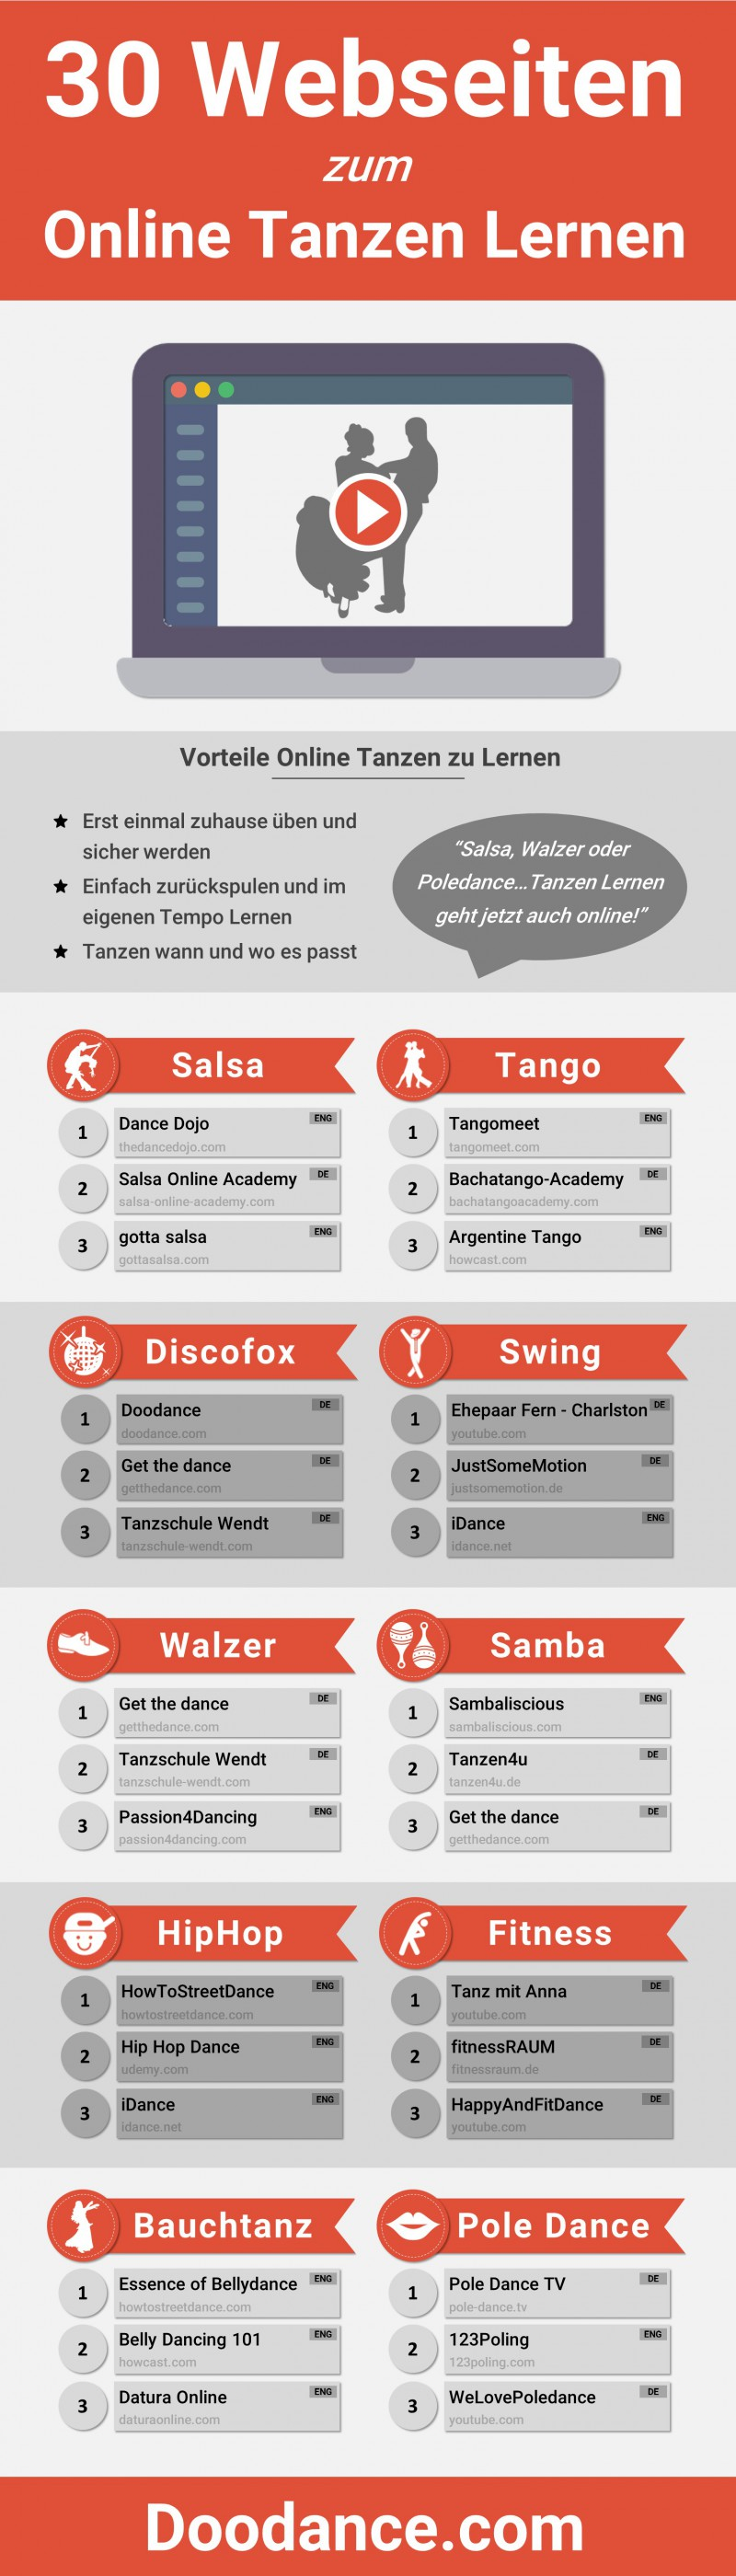 Infografik 30 Webseiten zum Online tanzen lernen